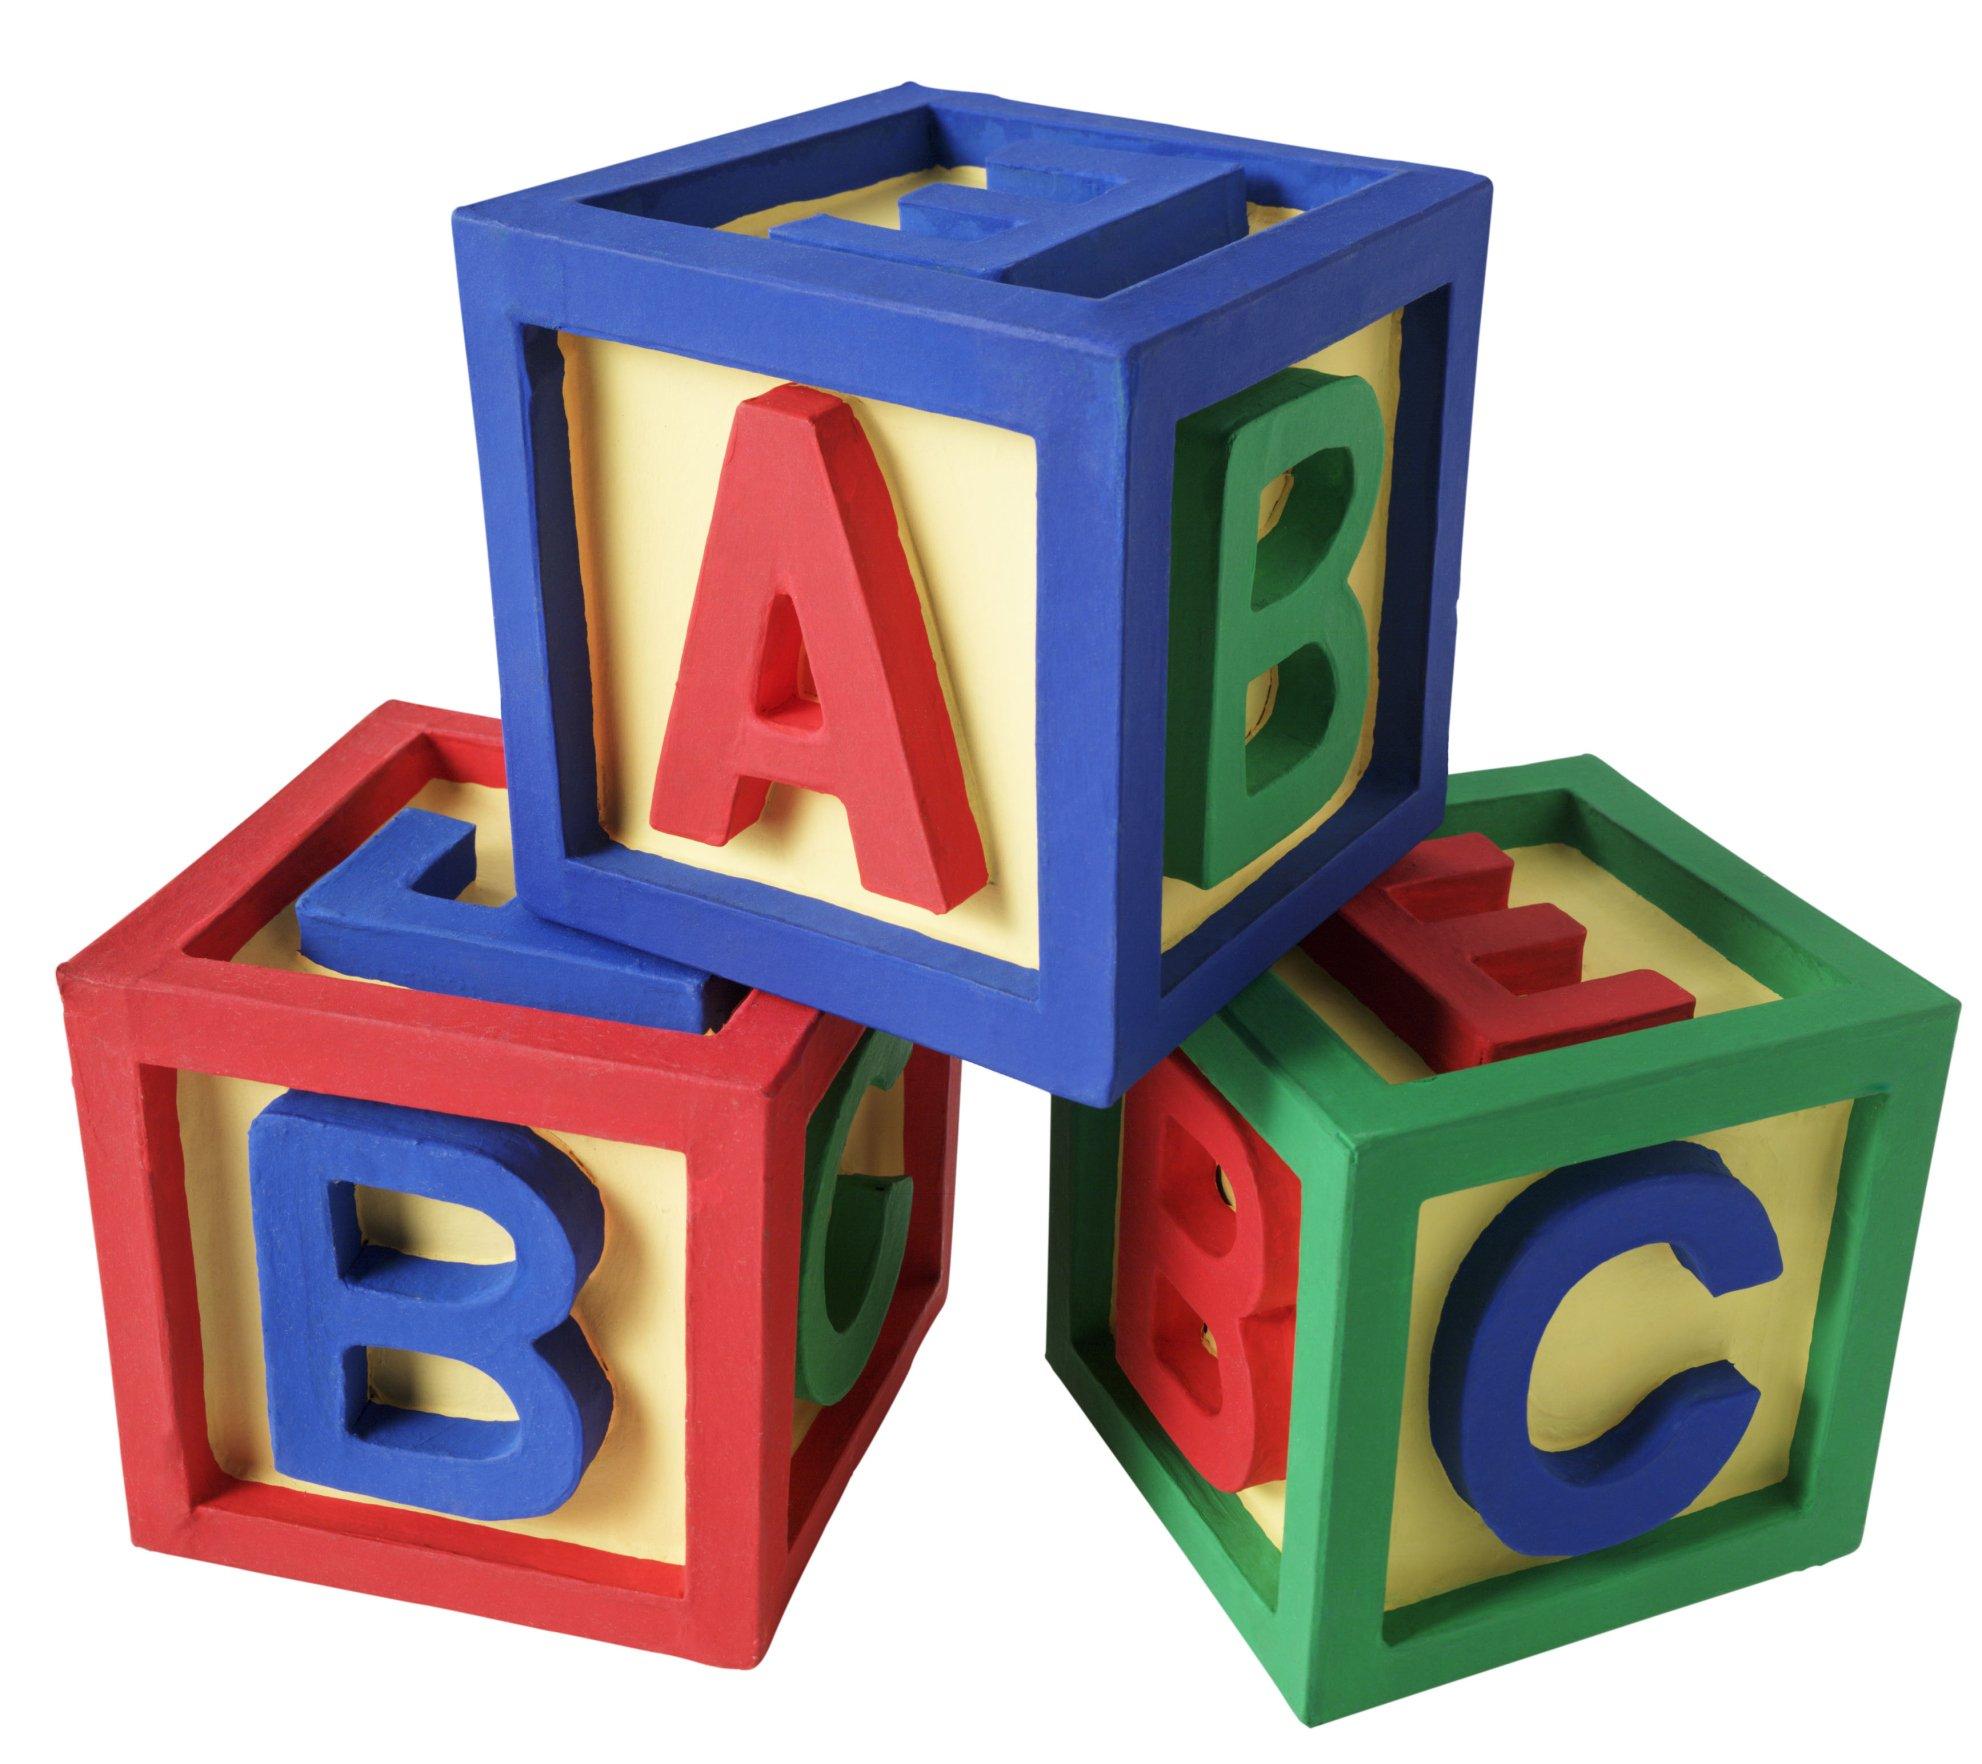 Childcare Company Uses Unique Approach to Reach Parents